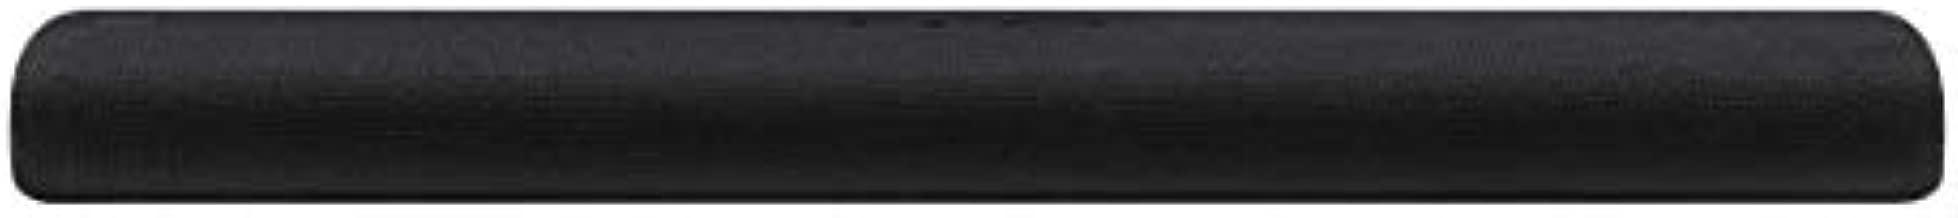 SAMSUNG 5.0ch S60A S Series Soundbar - Acoustic Beam and Alexa Built-in (HW-S60A, 2021 Model)